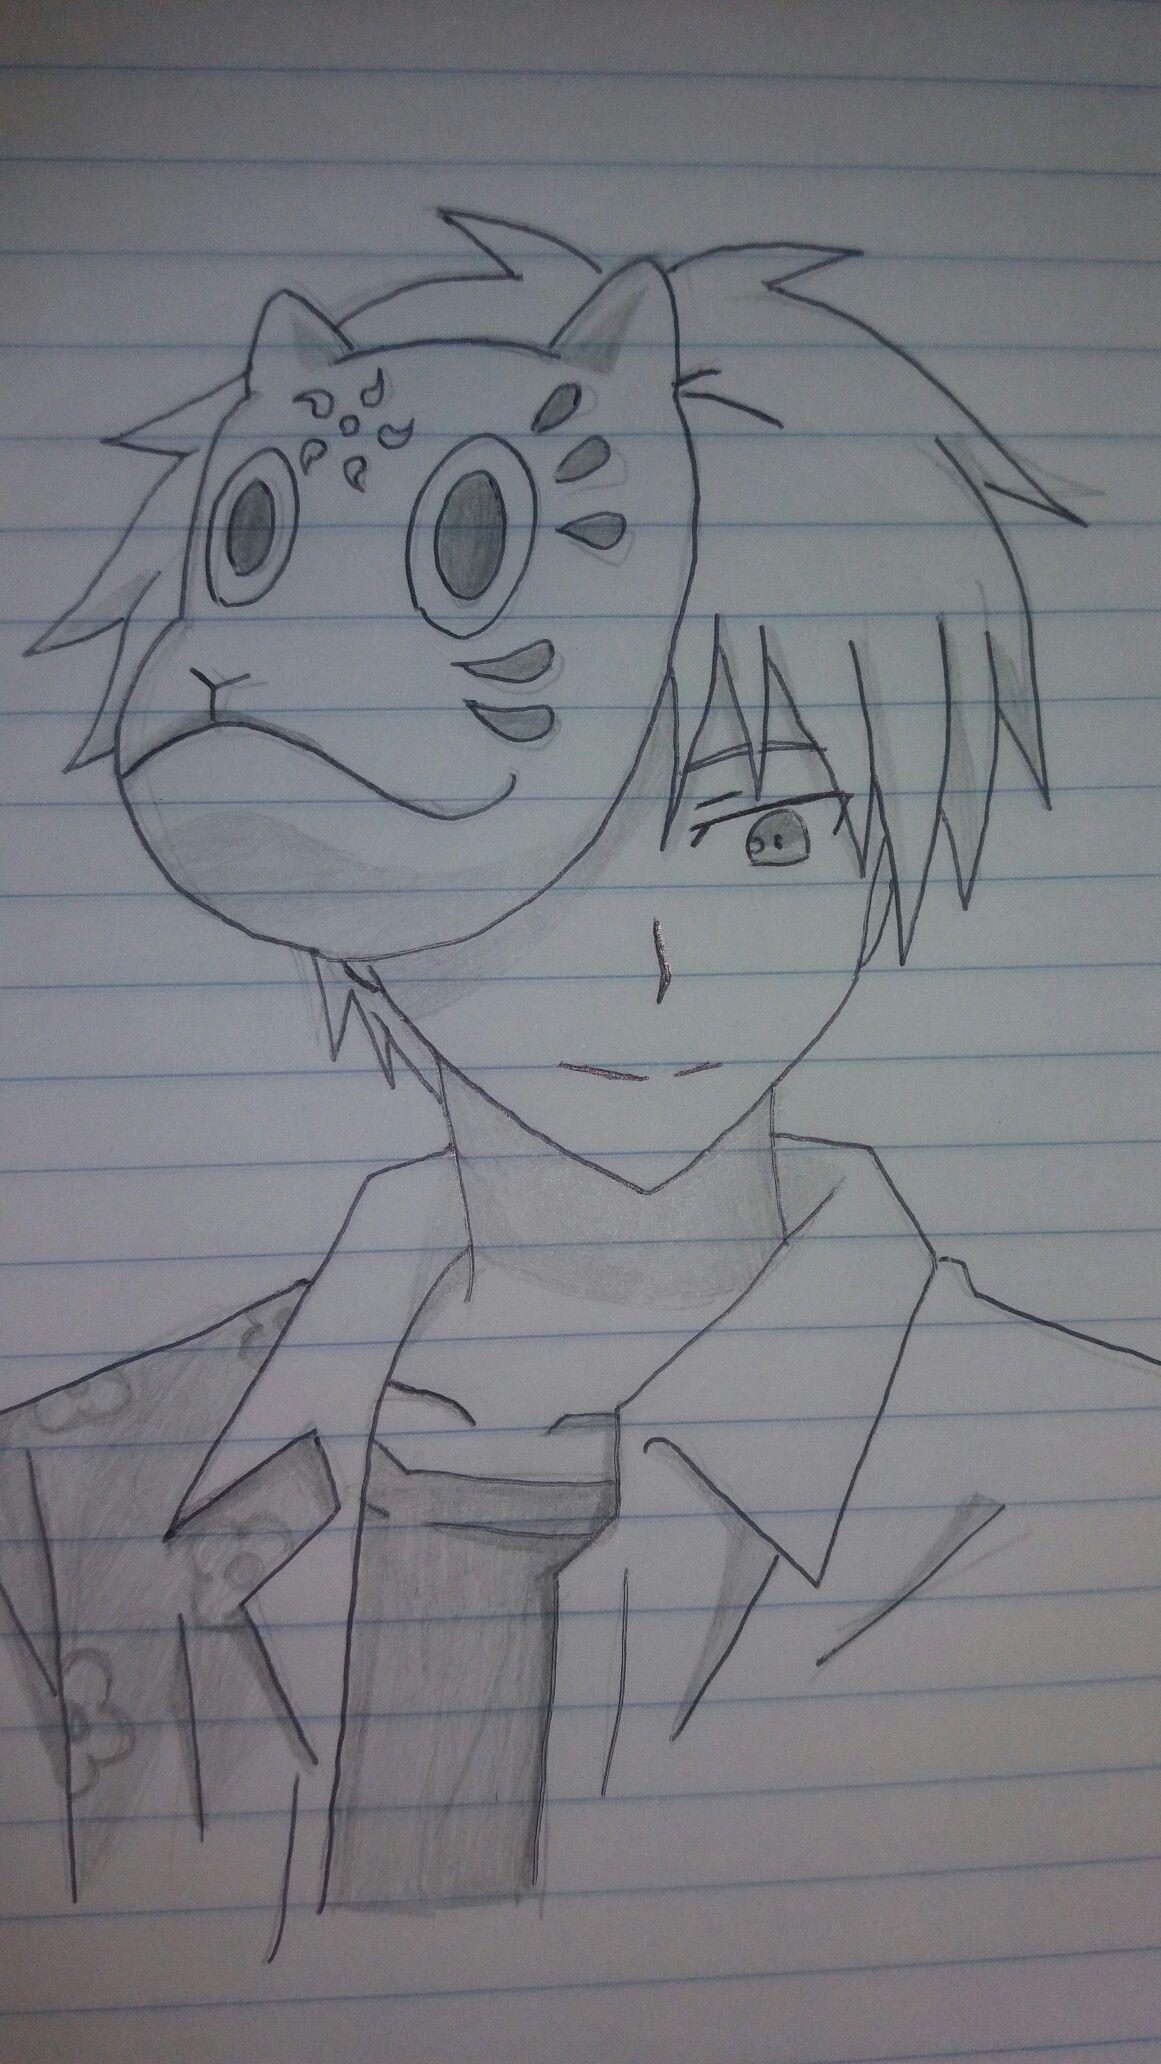 Pin Oleh Zaira M Di Manga Drawing Di 2020 Ilustrasi Karakter Sketsa Lukisan Arang